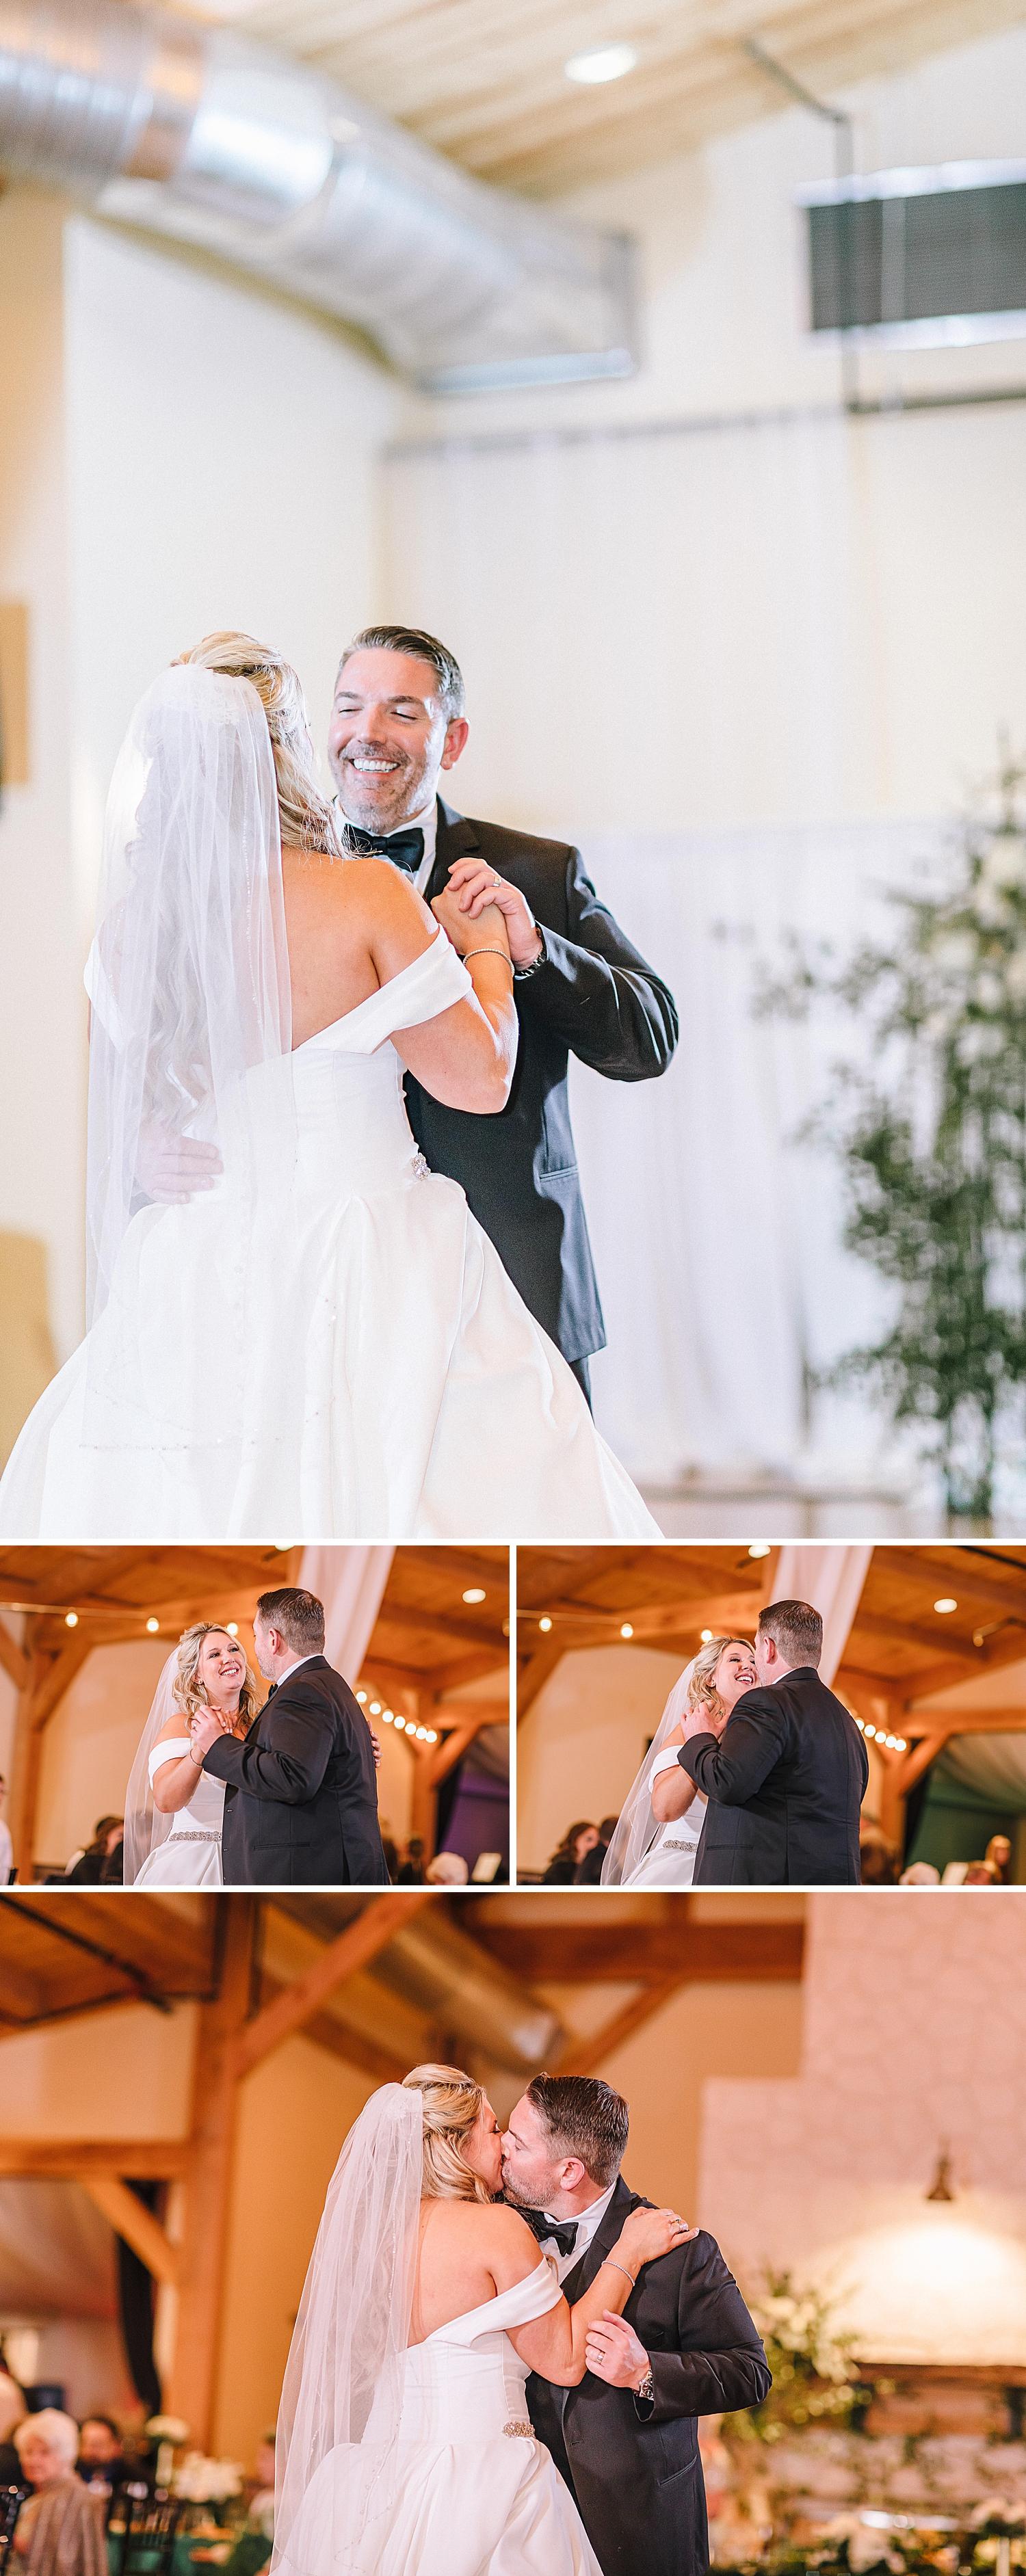 Magnolia-Halle-Wedding-San-Antonio-Texas-Bride-Grom_0090.jpg